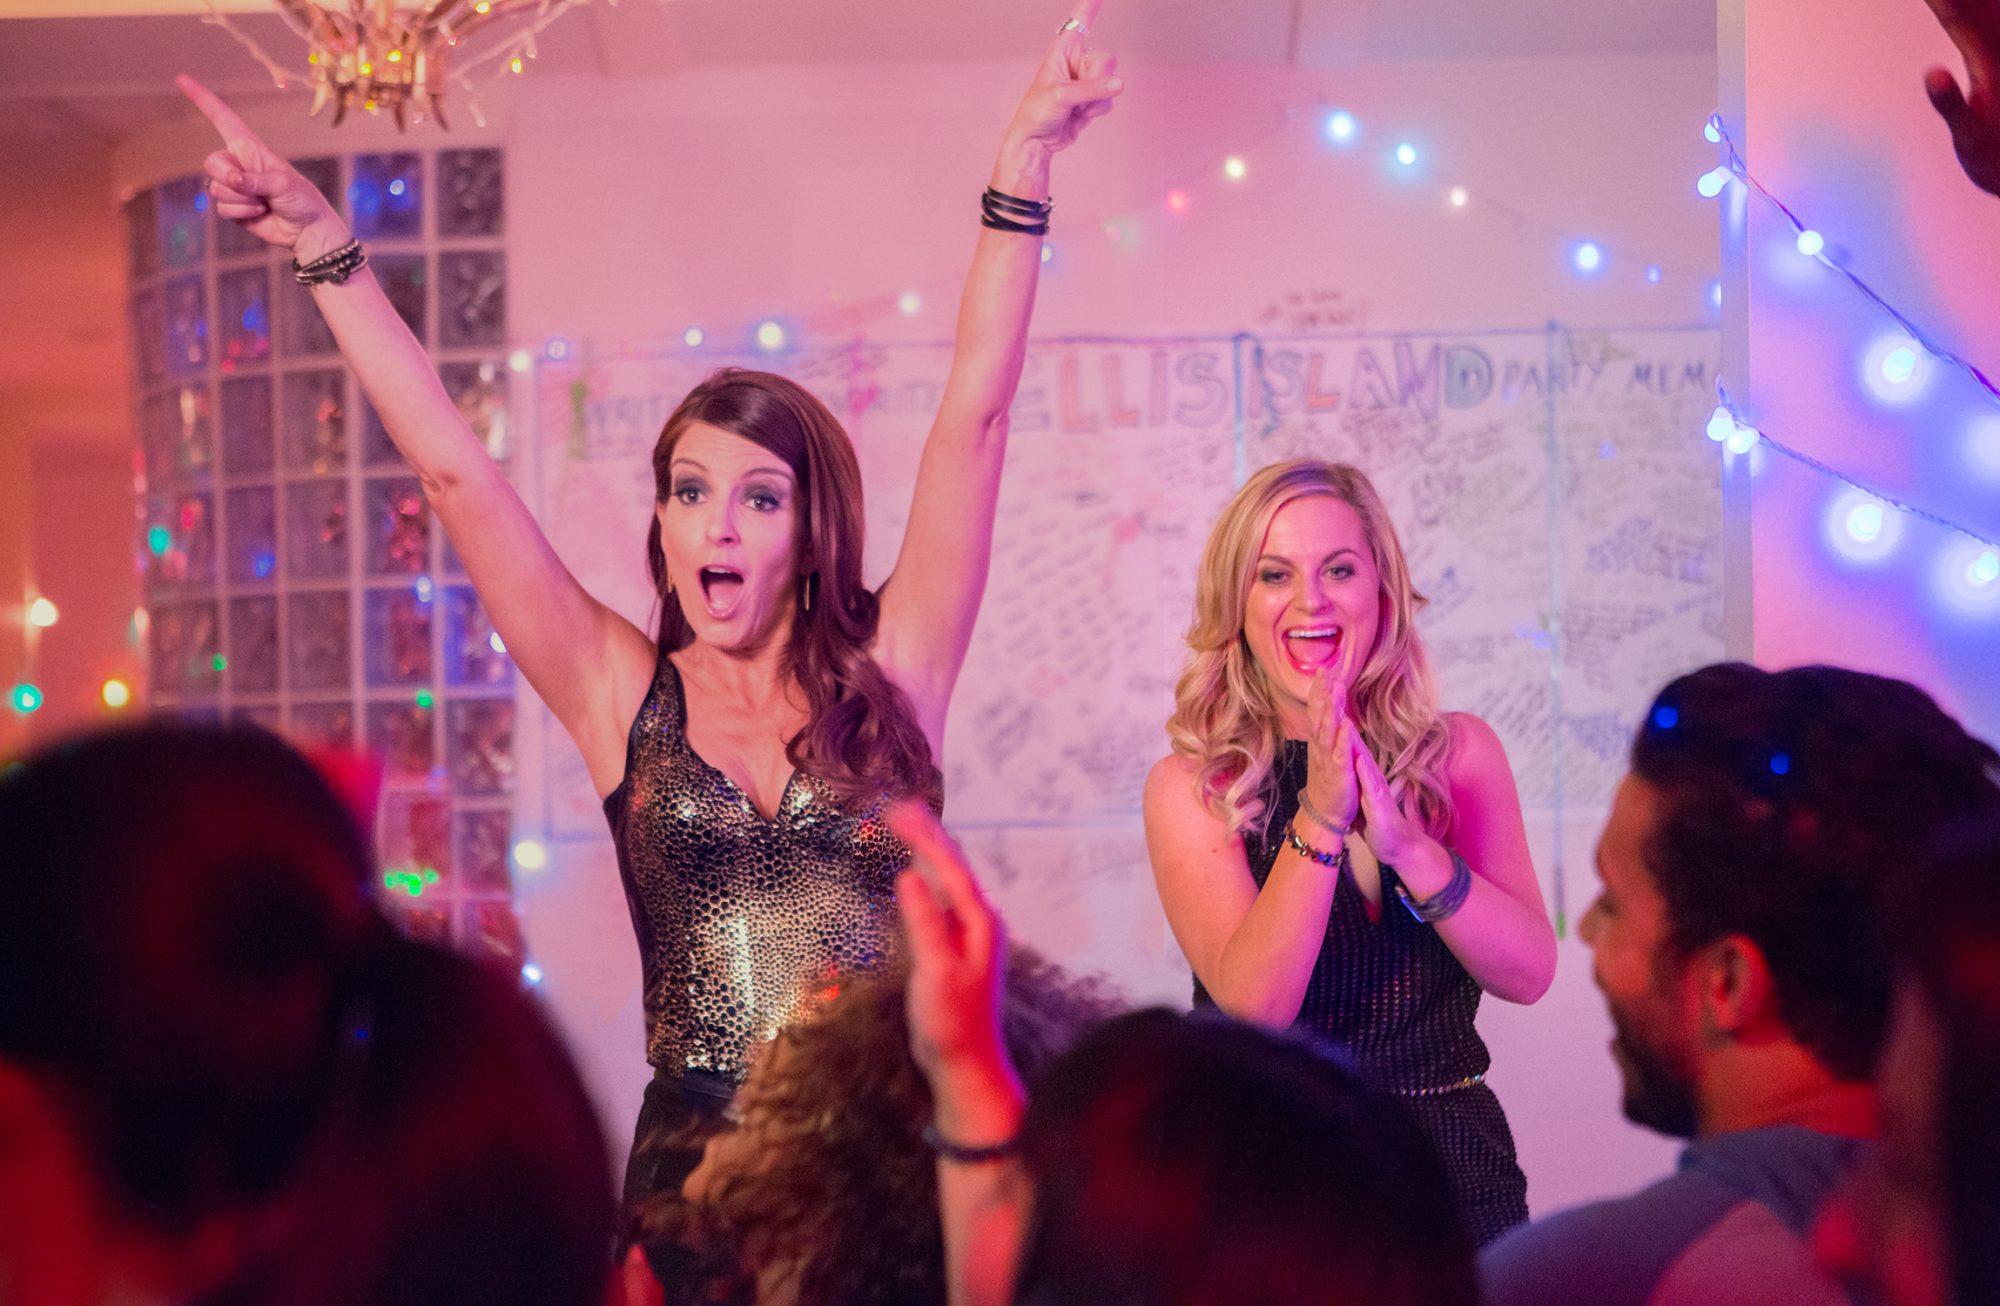 tina-fey-amy-poehler-sisters-movie-image-2.jpg